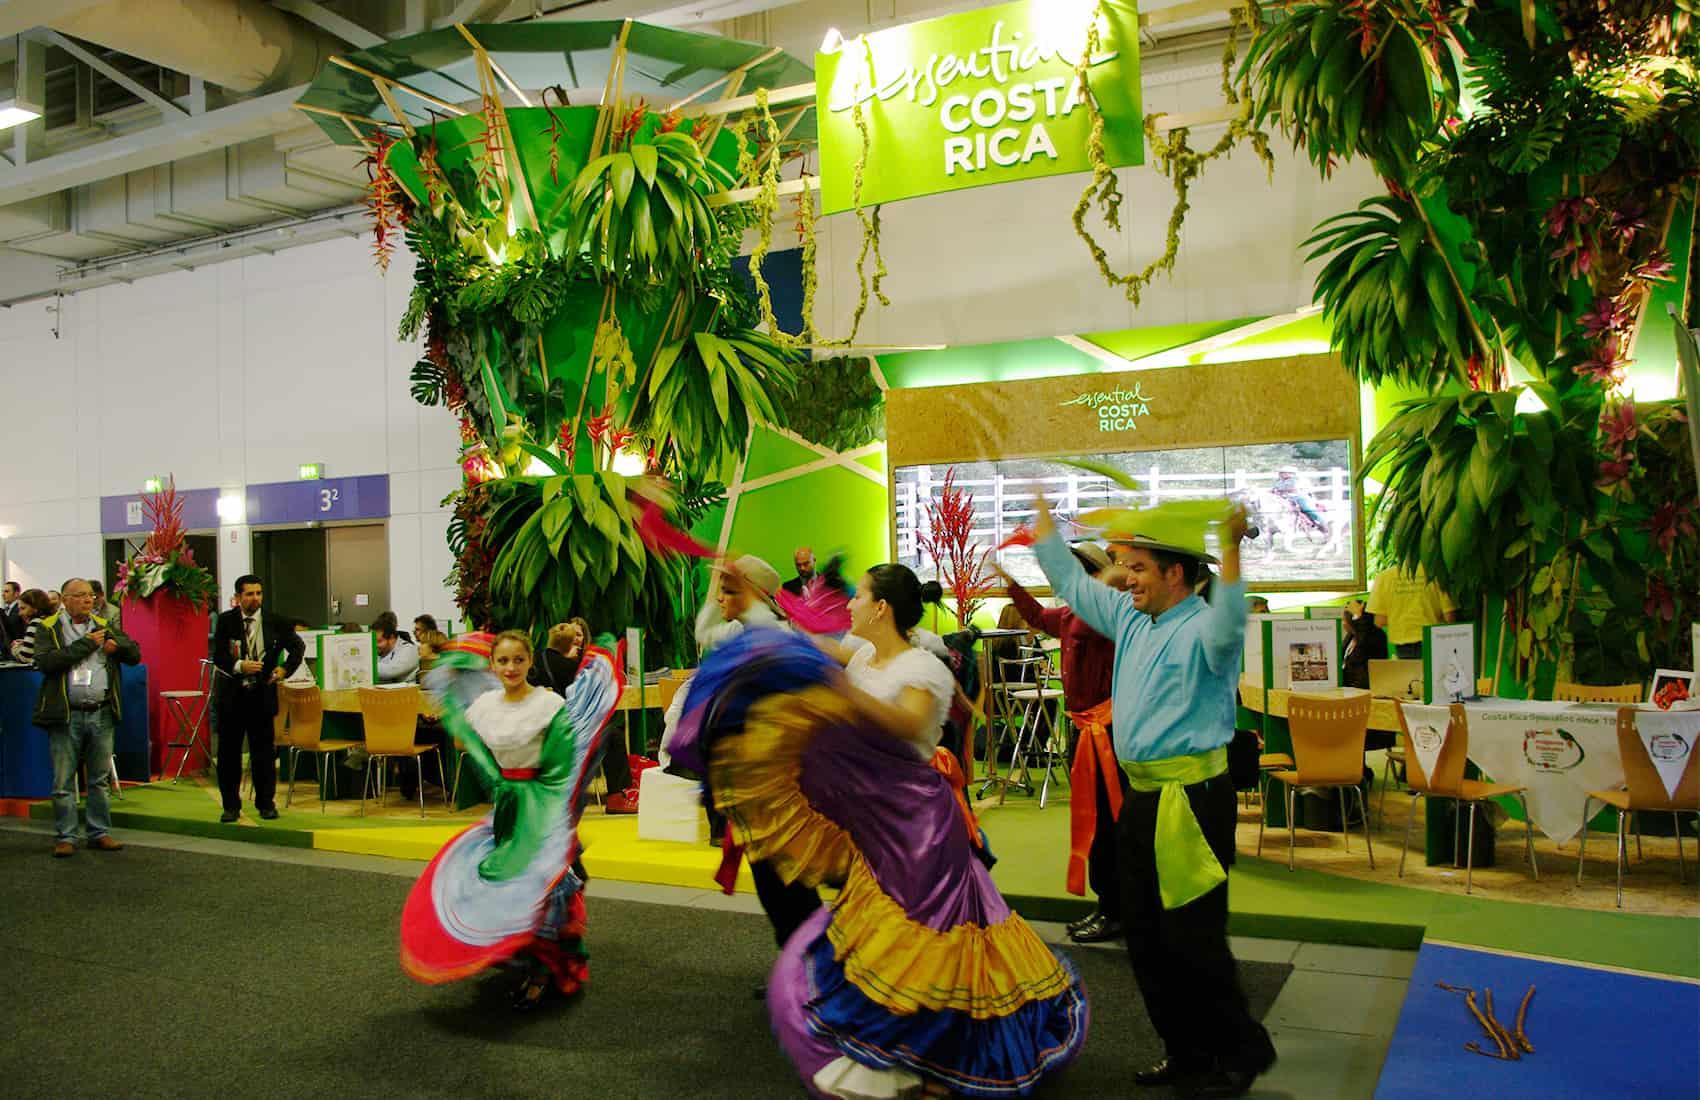 Costa Rica at ITB Berlin 2014